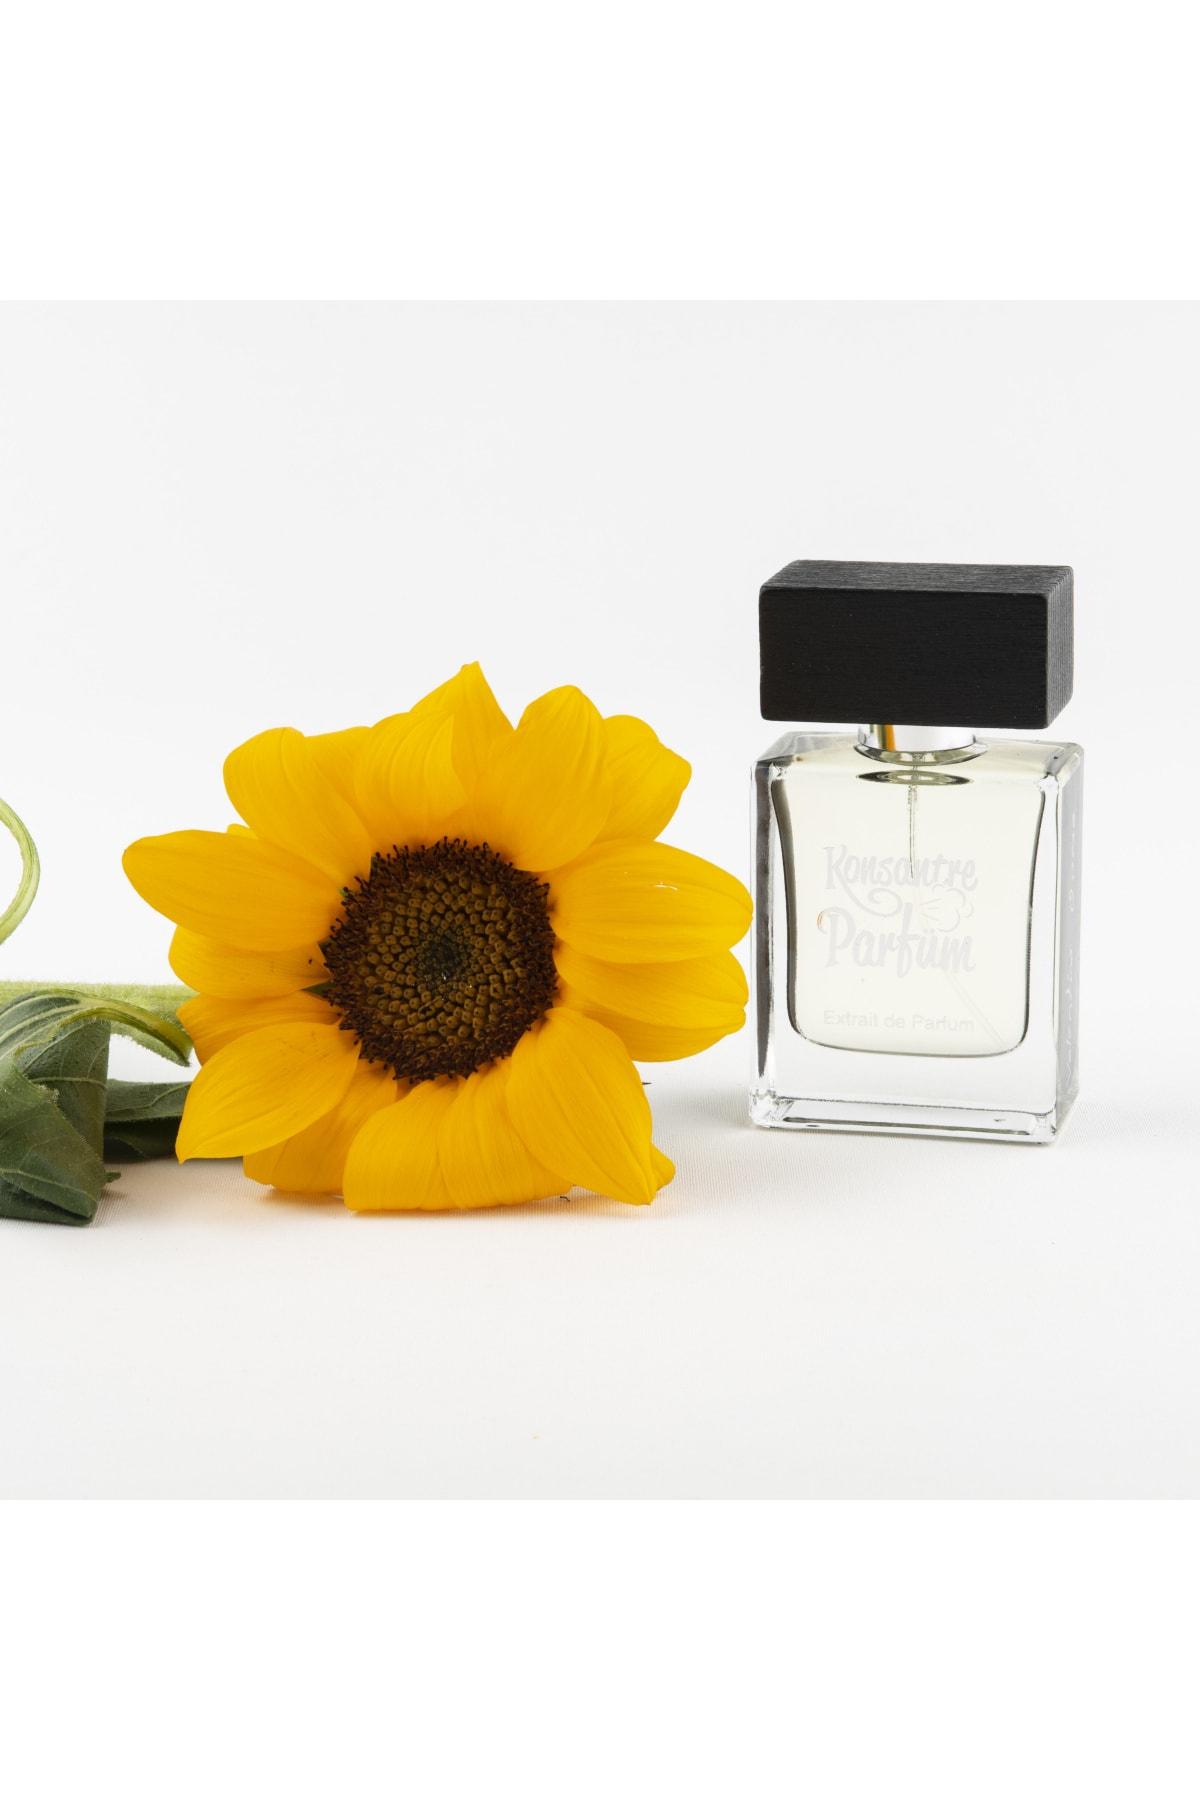 Konsantre Parfüm Baccarat Rouge 540 Tipi 50 ml Edp Kadın Parfümü 2020001000805 2